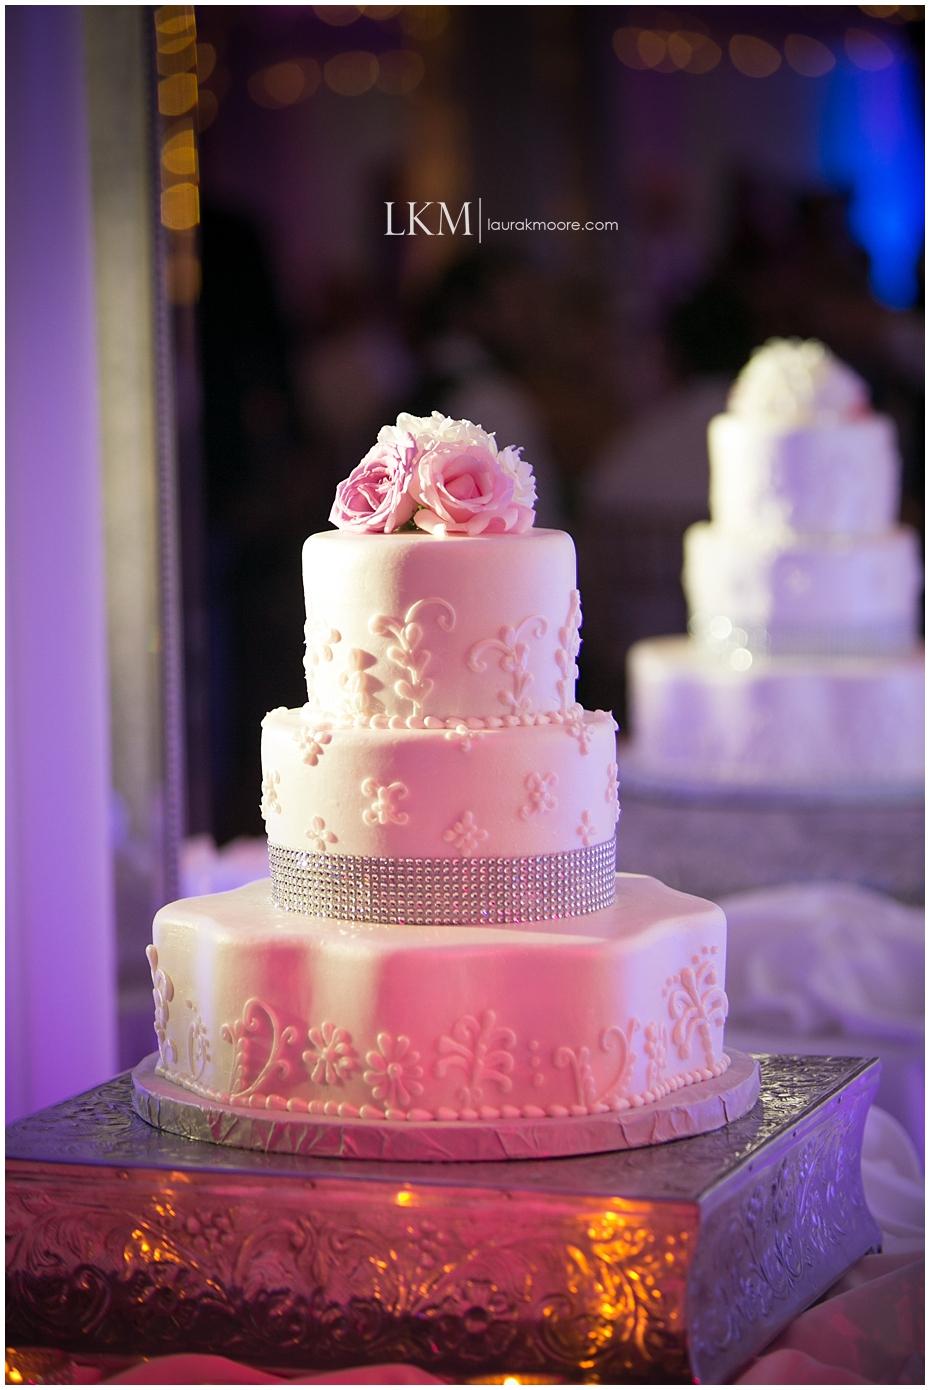 Kristen-Dalton-Celebrity-Wedding-Photography-The-Vineyards-Simi-Valley_0160.jpg